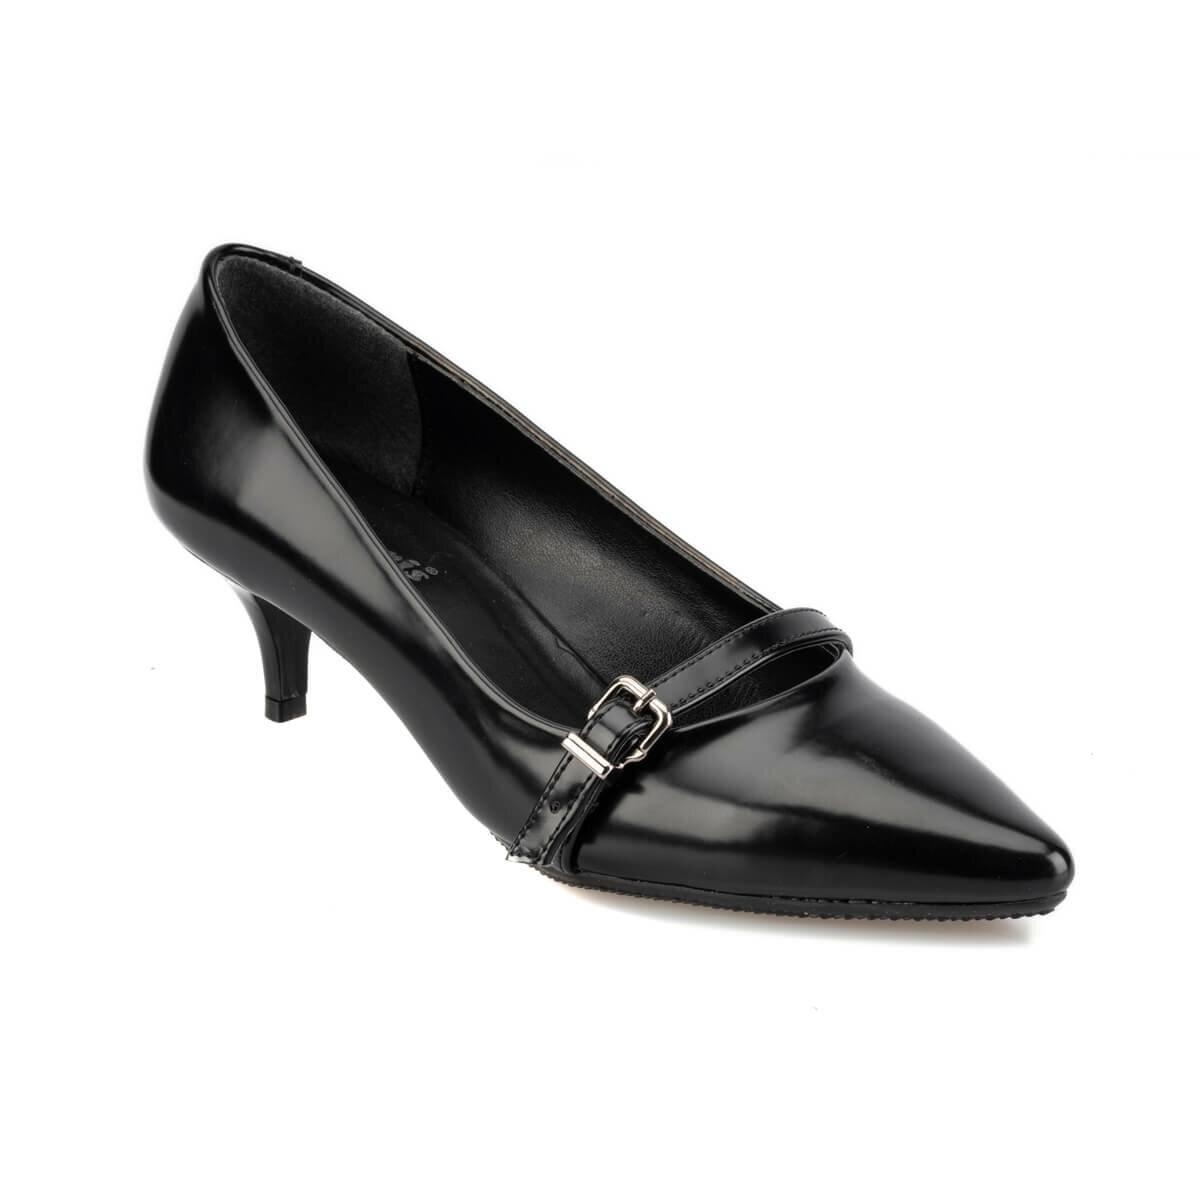 FLO 92.314056.Z Black Women Gova Shoes Polaris